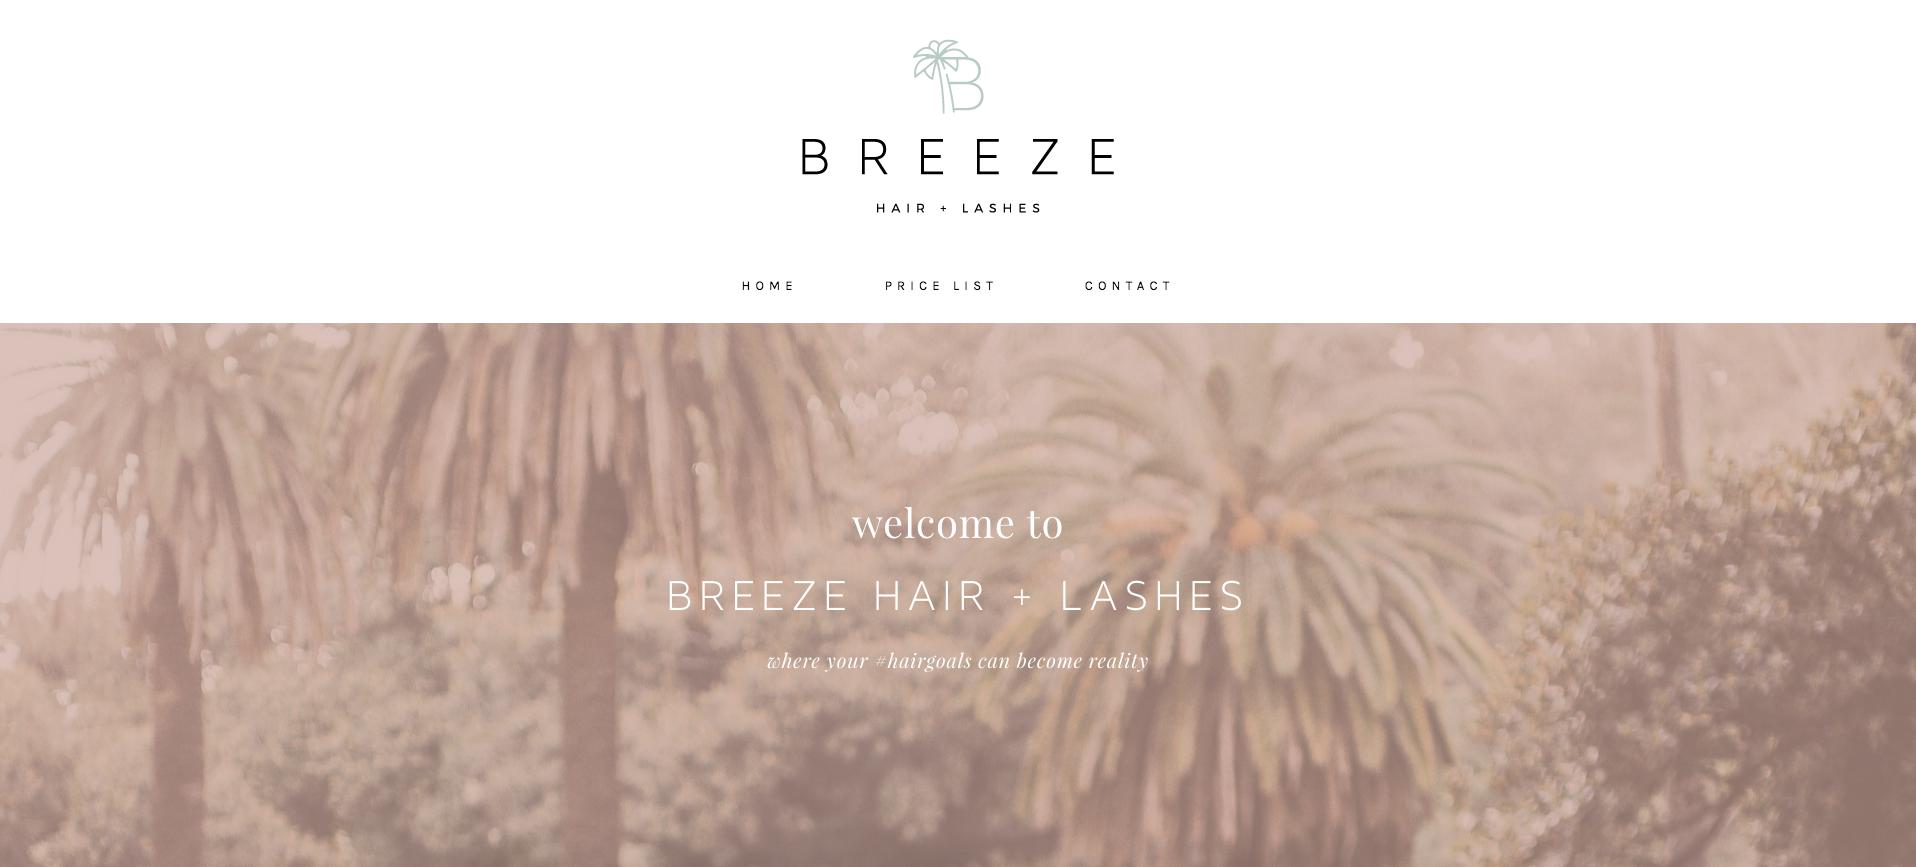 BREEZE HAIR + LASHES - BEAUTY WEBSITE